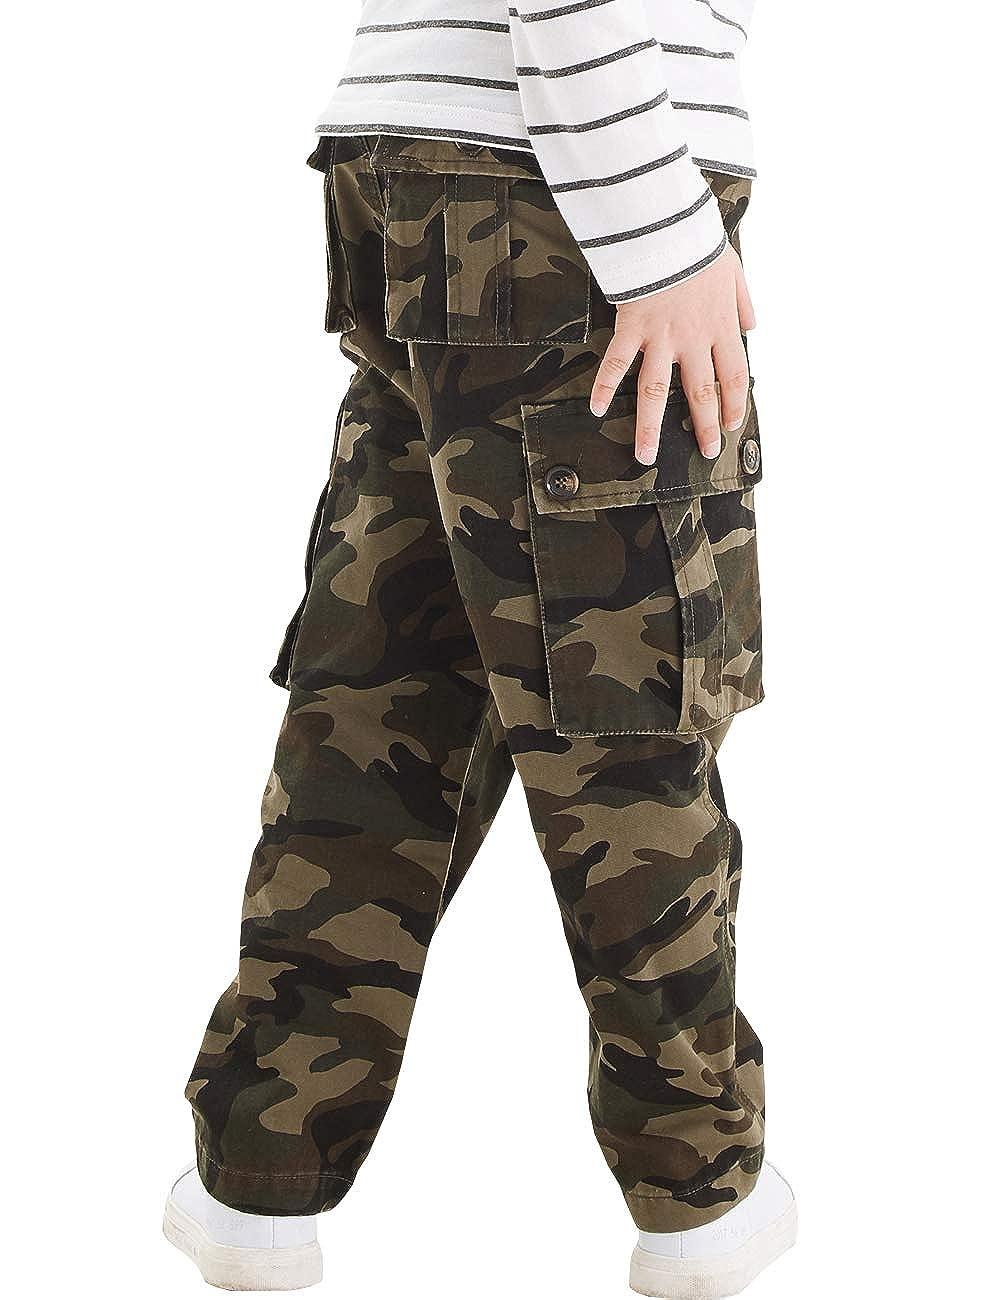 51801b6800 Amazon.com: BYCR Boys' Skinny Cargo Jogging Pants Cotton Regular Straight Stretch  Trousers: Clothing